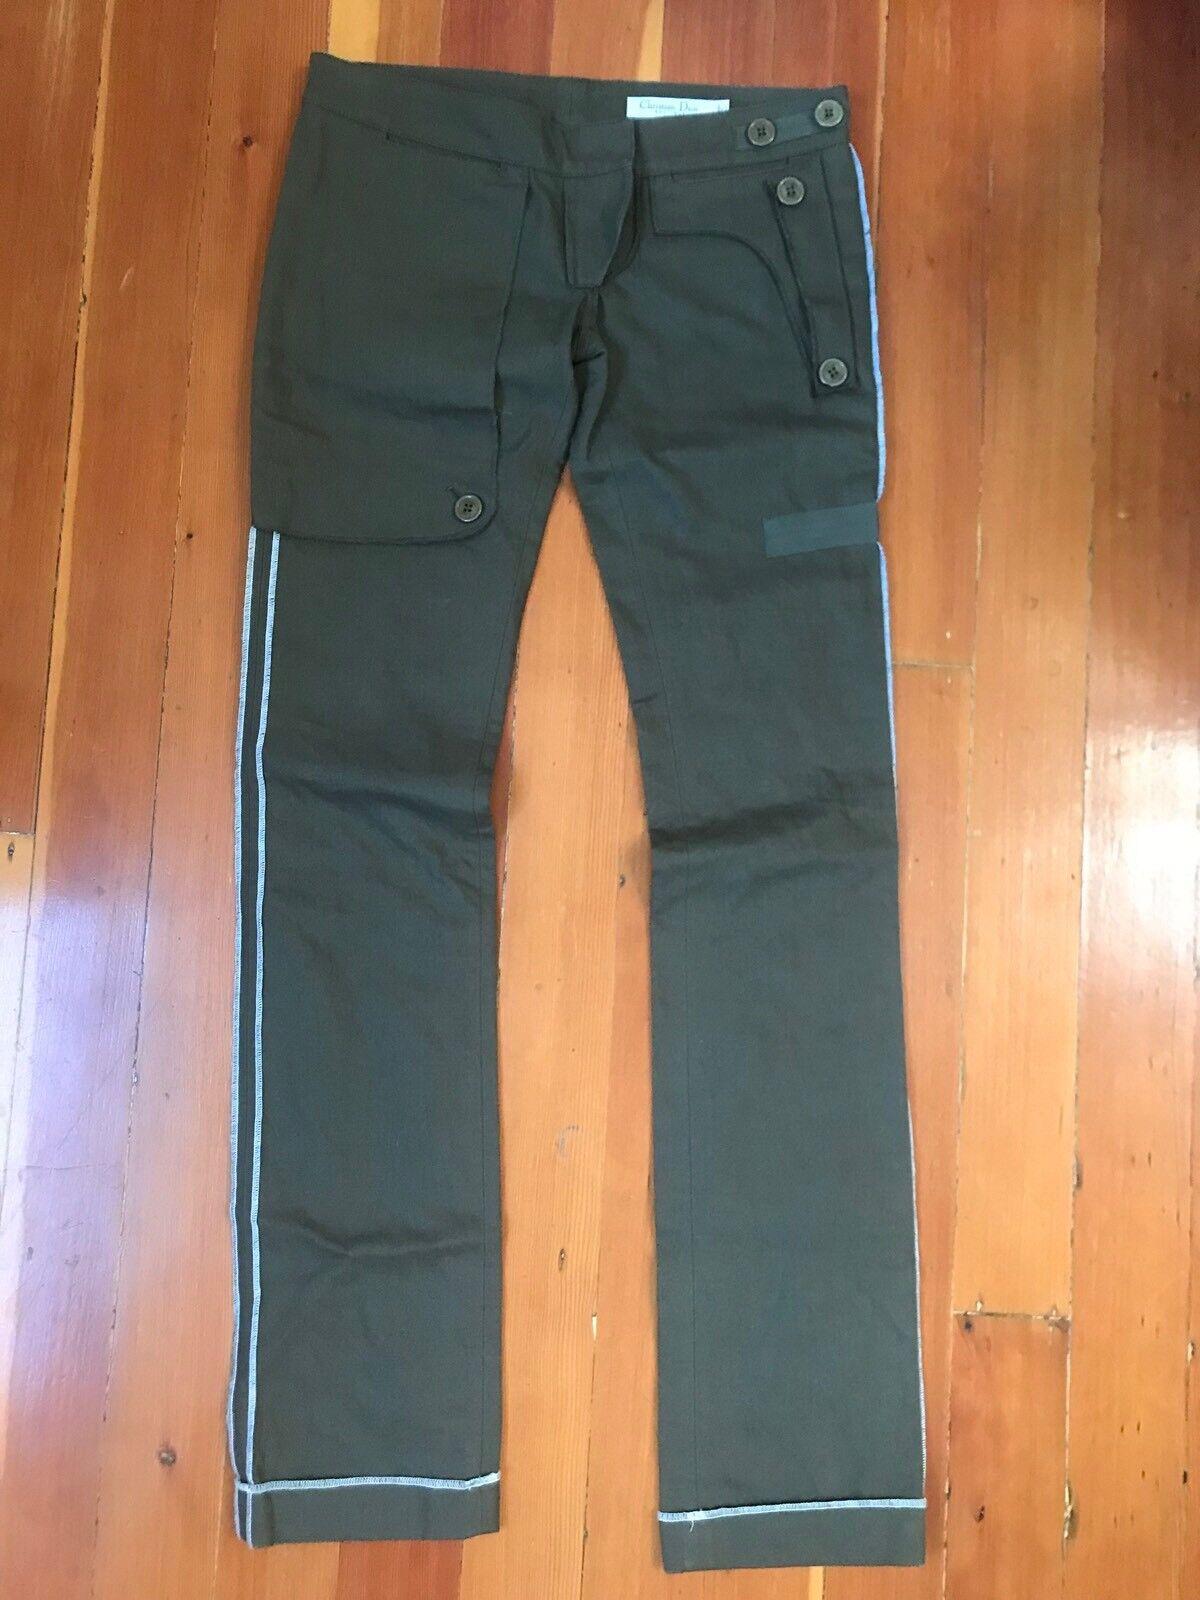 Auth. christian dior paris khaki green cotton pants XS 2 US 38 ITALY